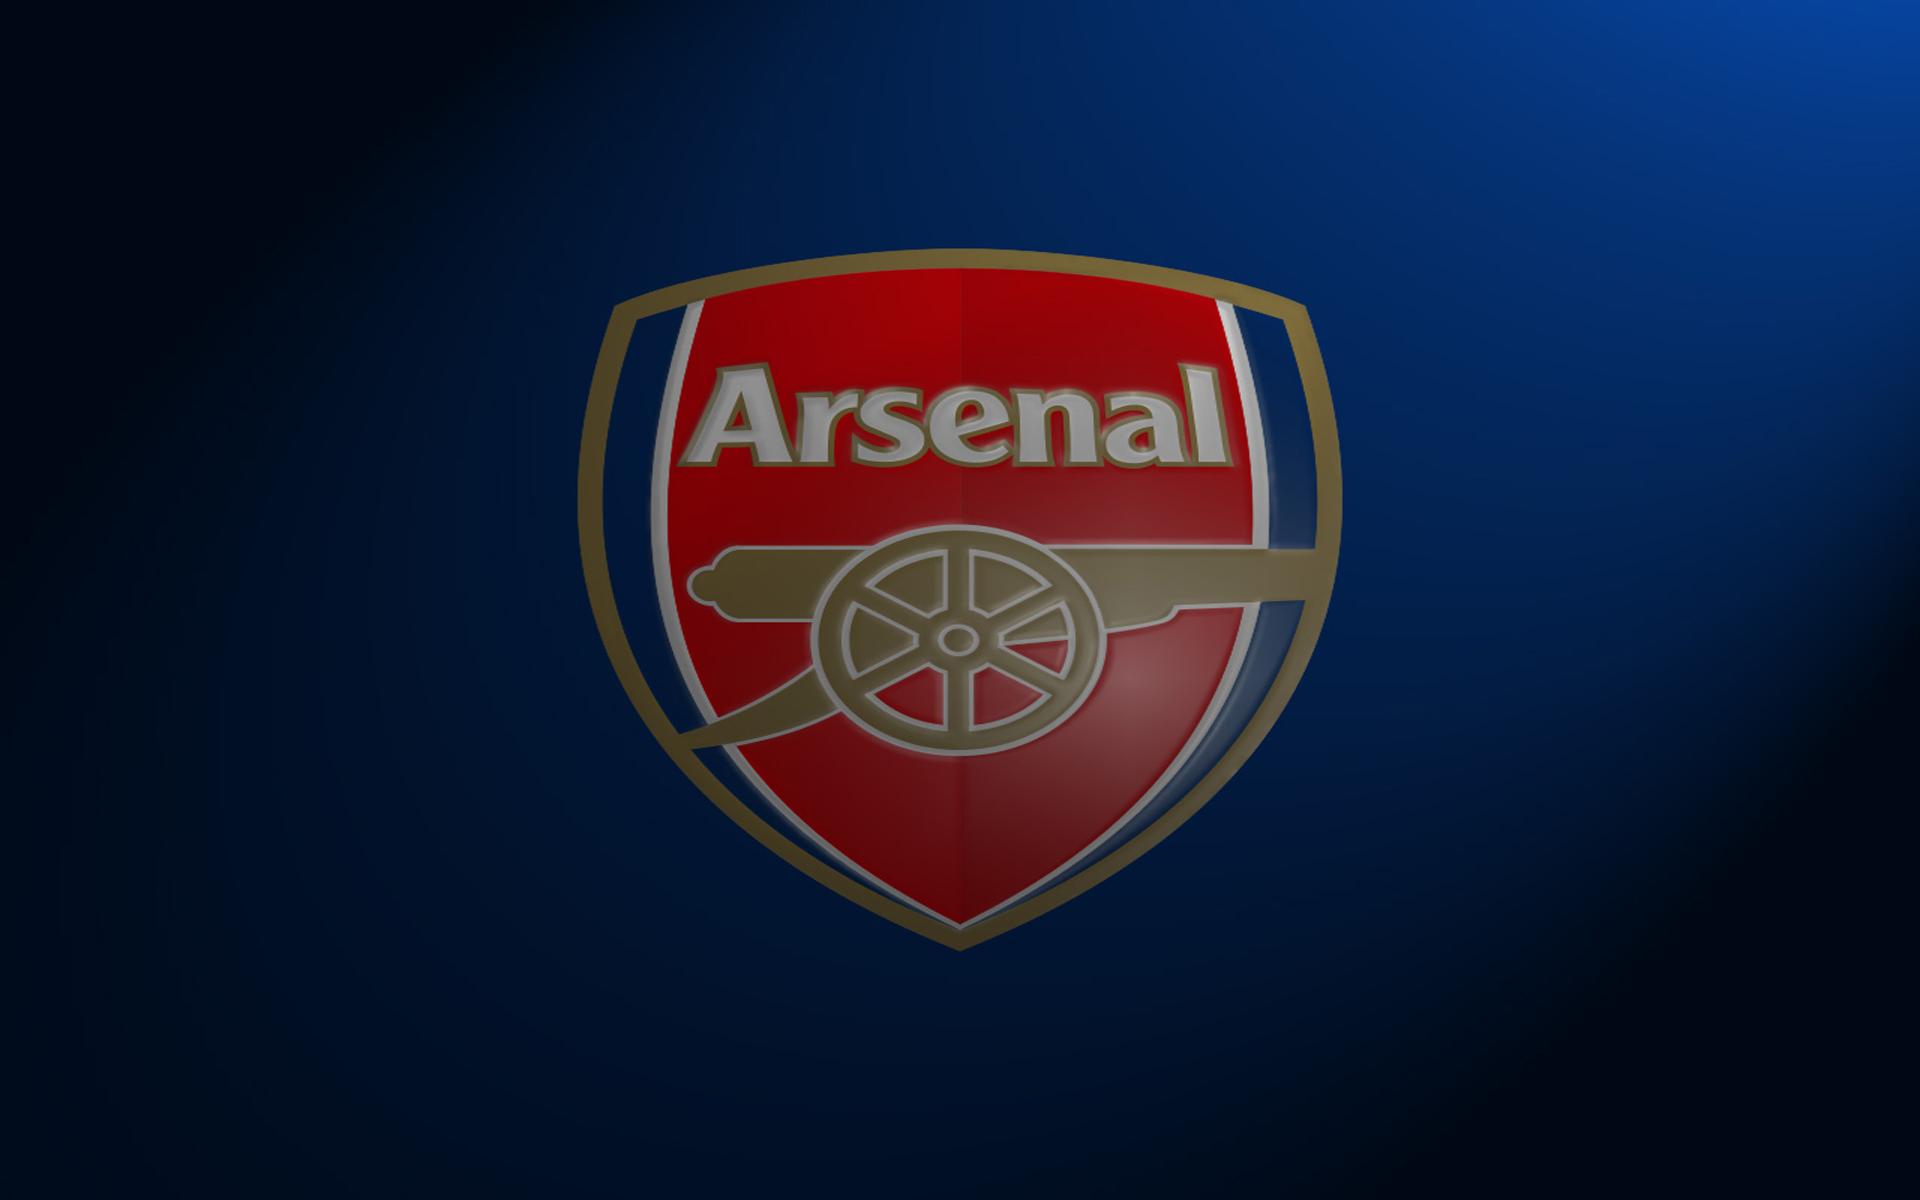 arsenal logo hd wallpaper hd soccer